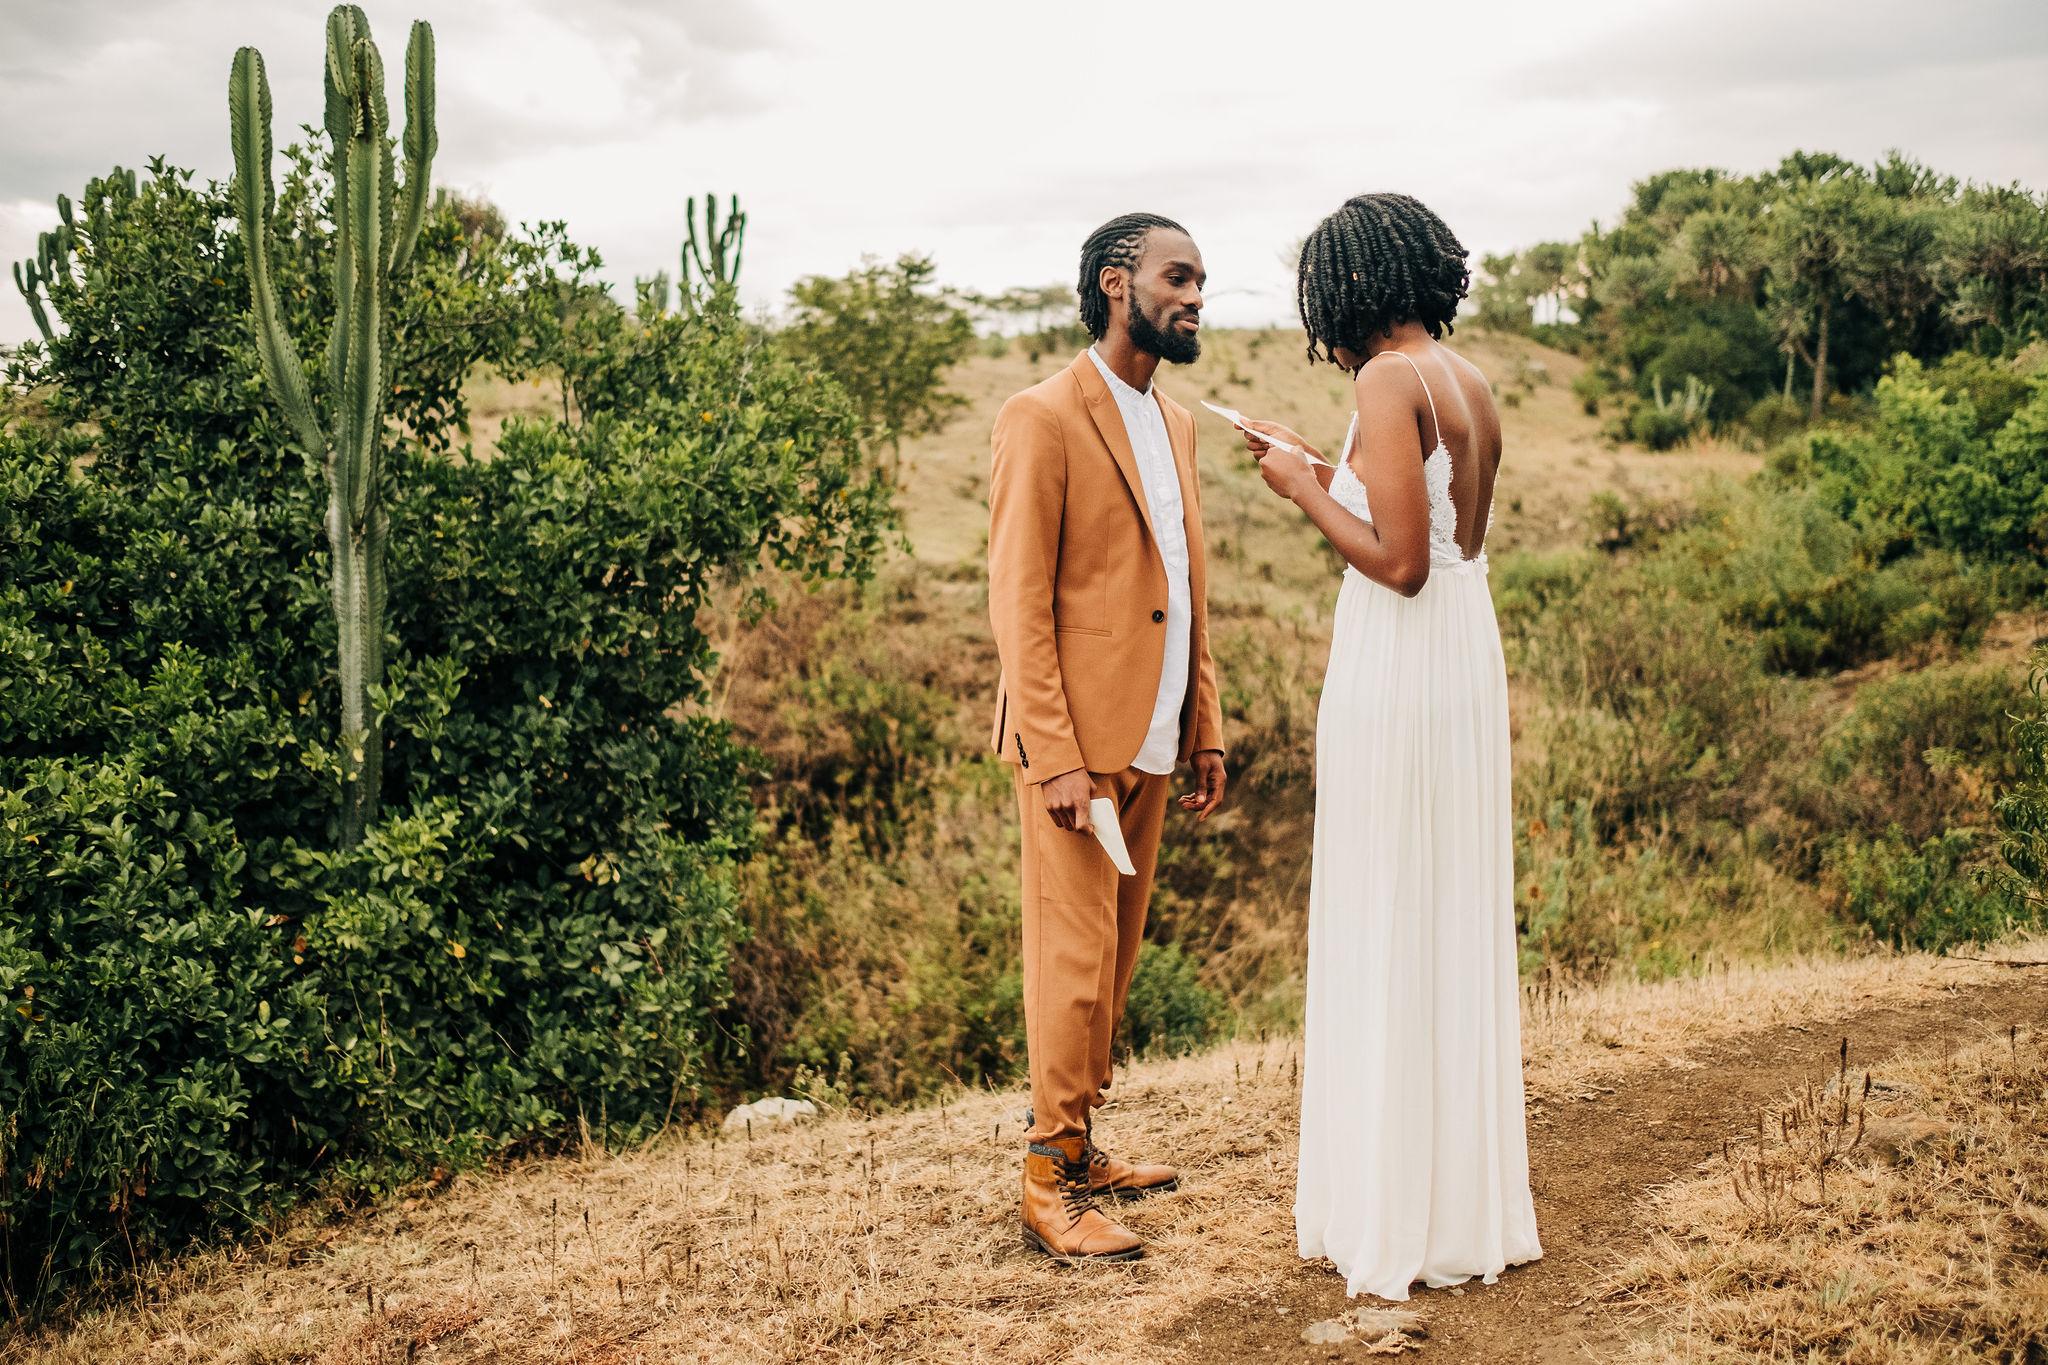 Anna-Hari-Photography-Destination-Wedding-Photographer-Kenya-132.jpg